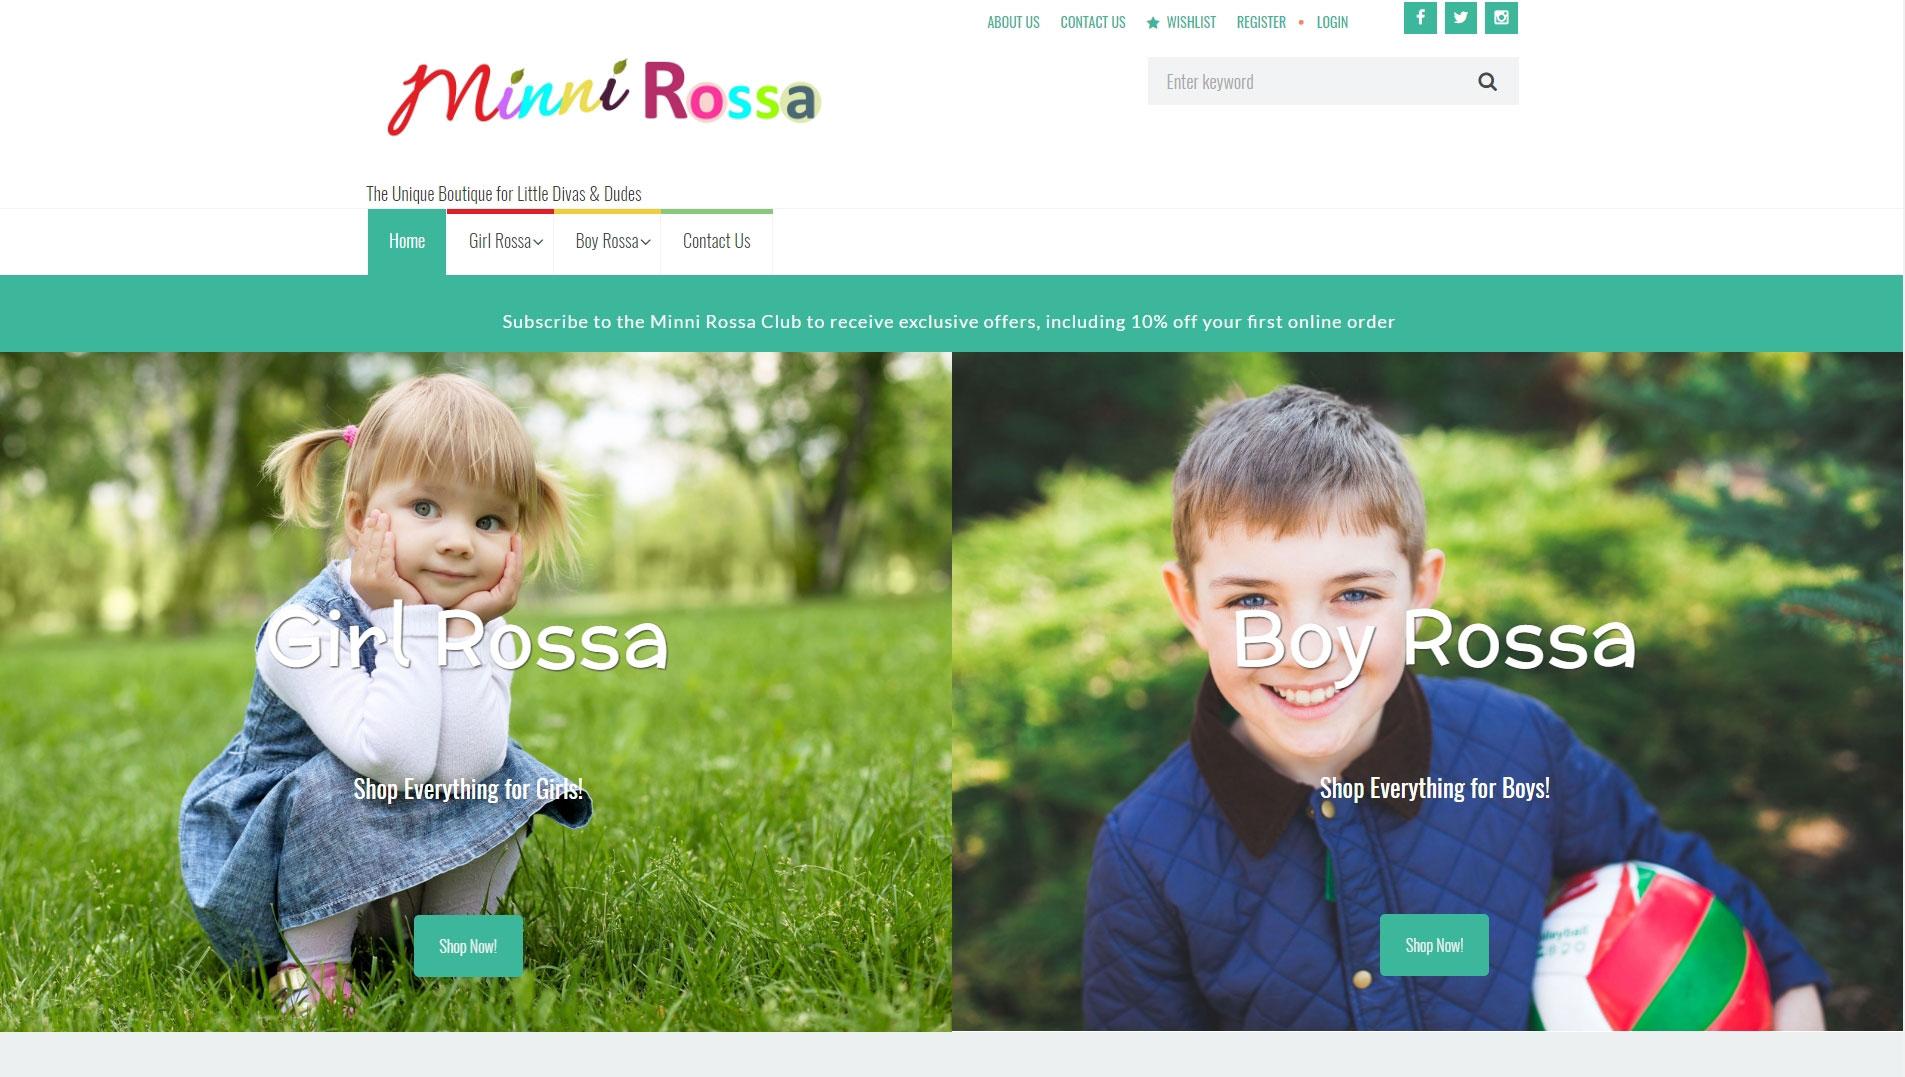 MinniRossa.com Website Image